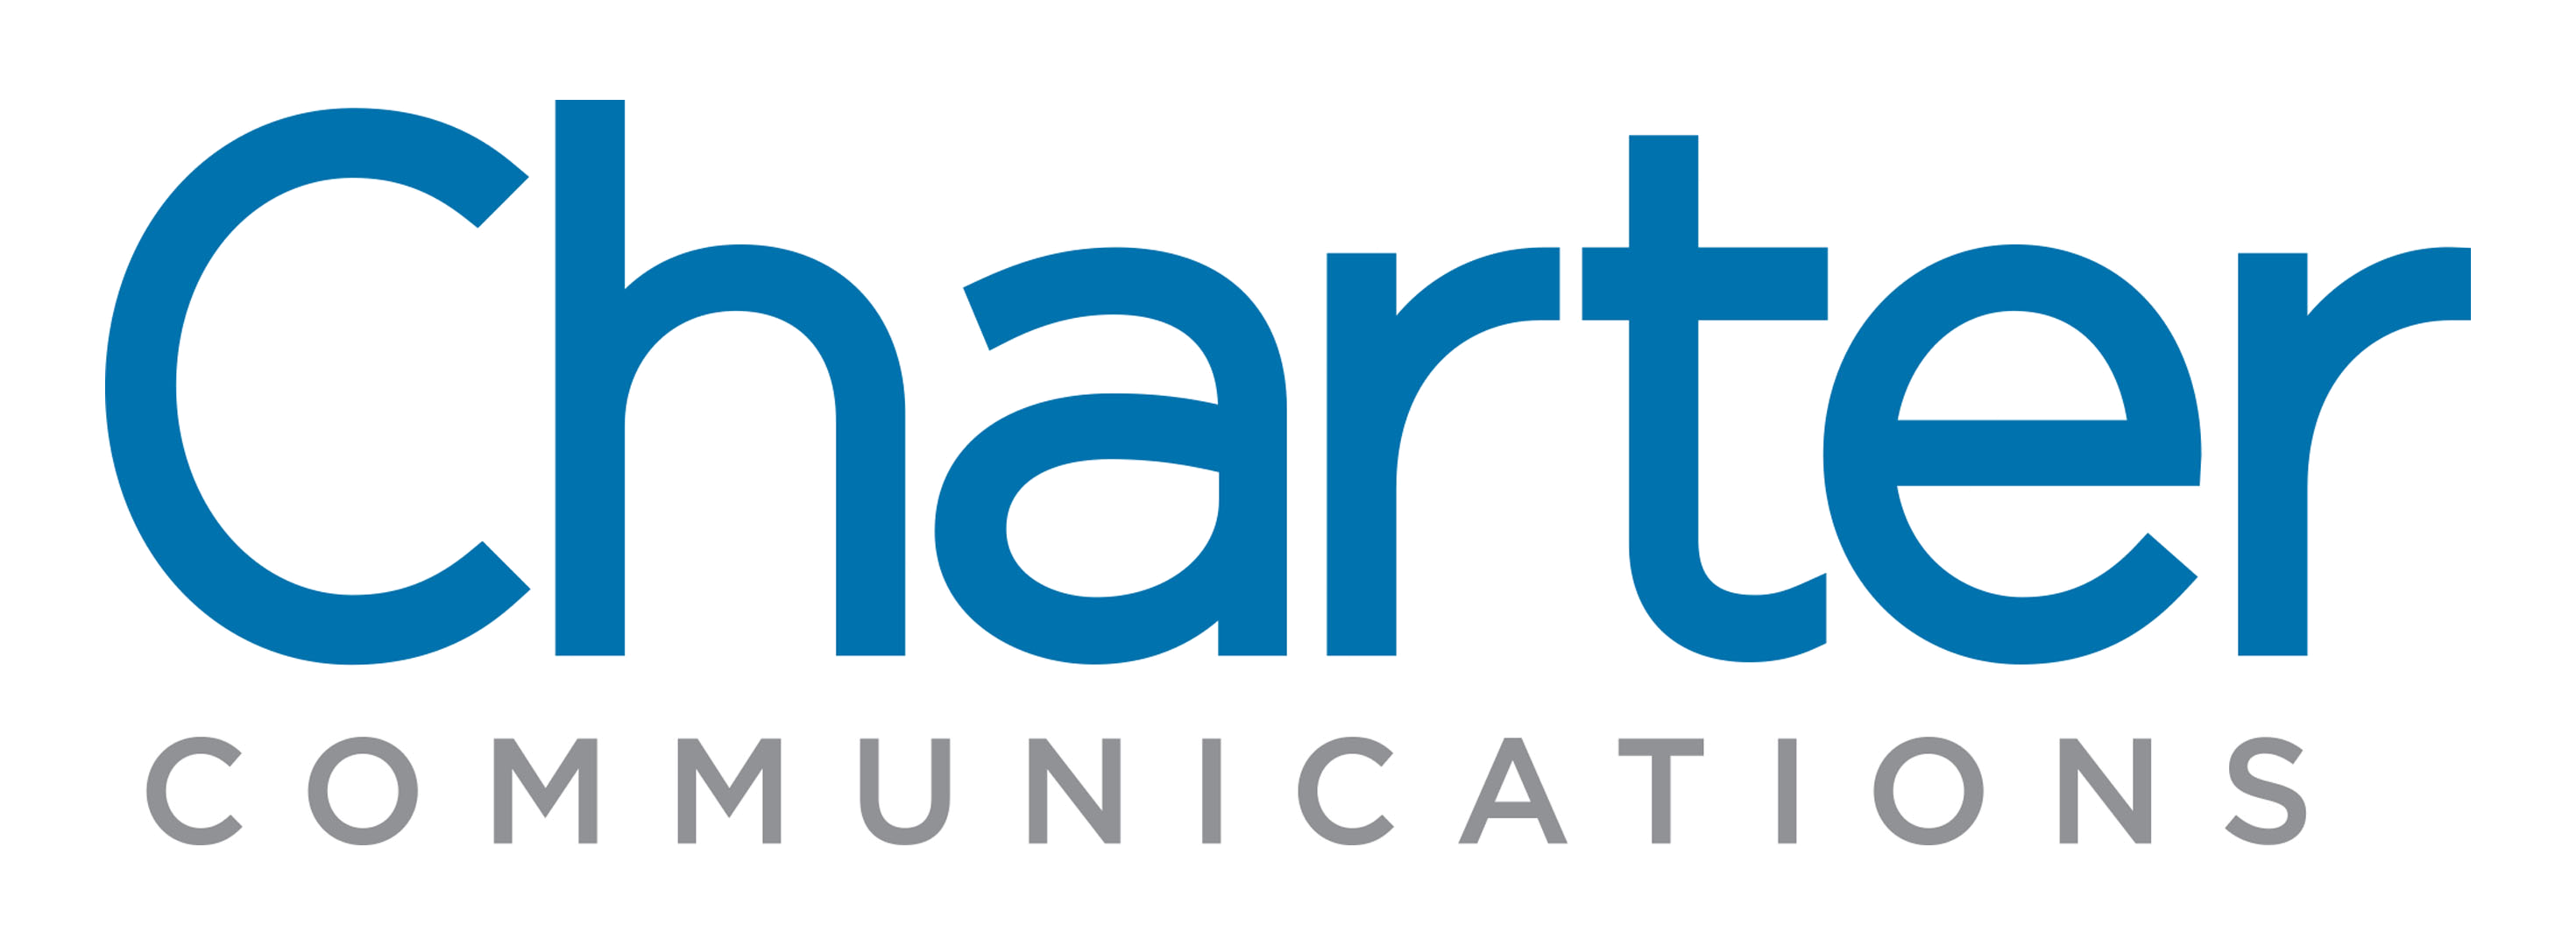 Charter Communications Logo PNG Transparent.